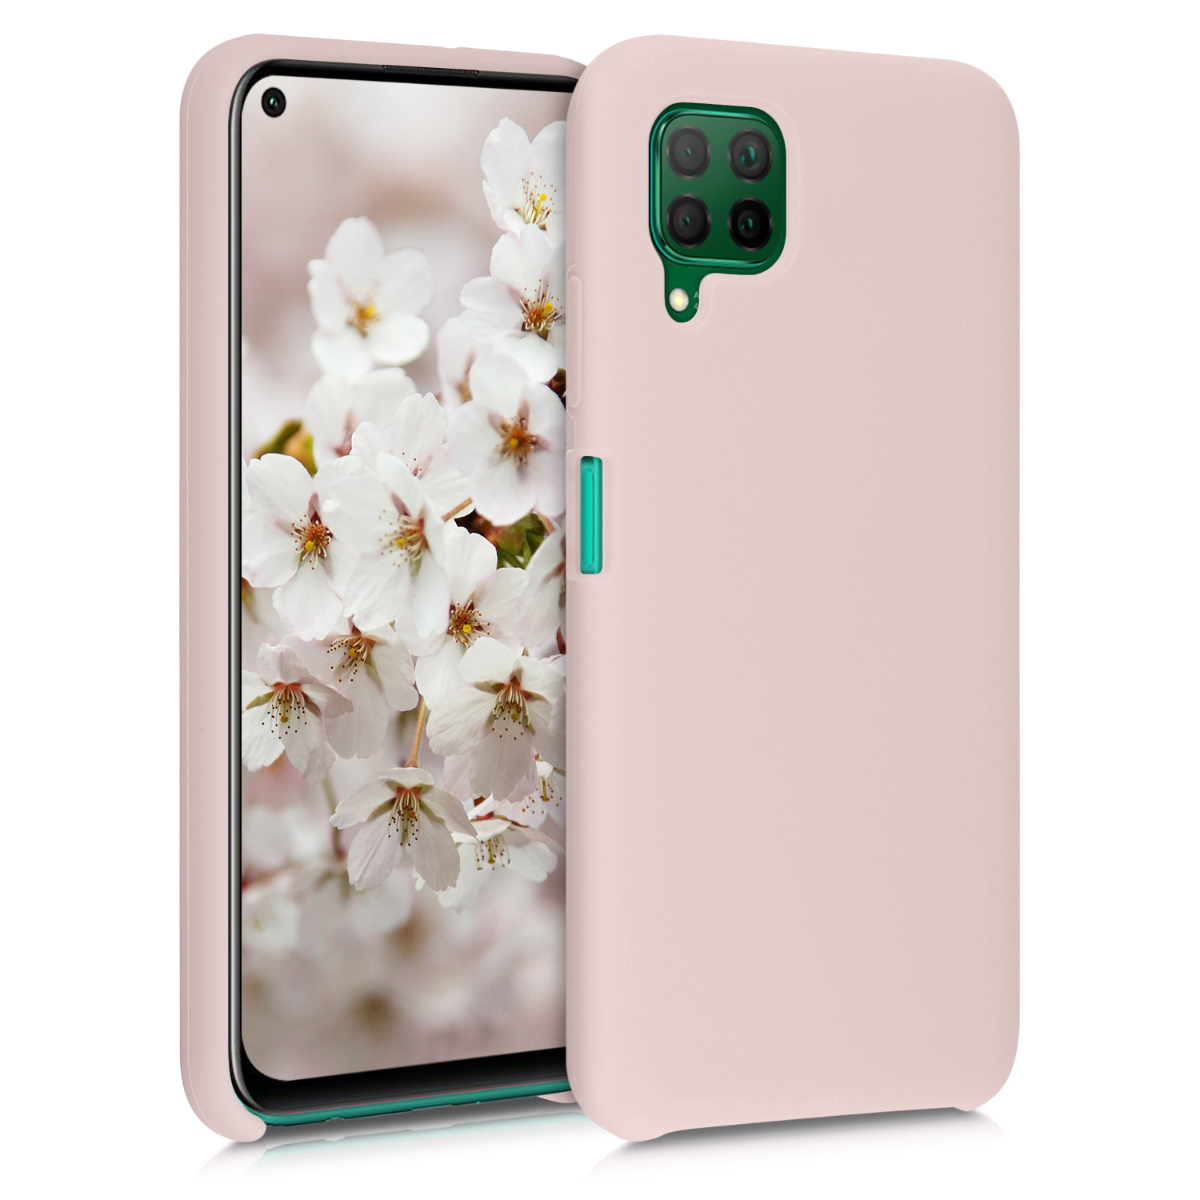 Růžové silikonové pouzdro / obal pro Huawei P40 Lite